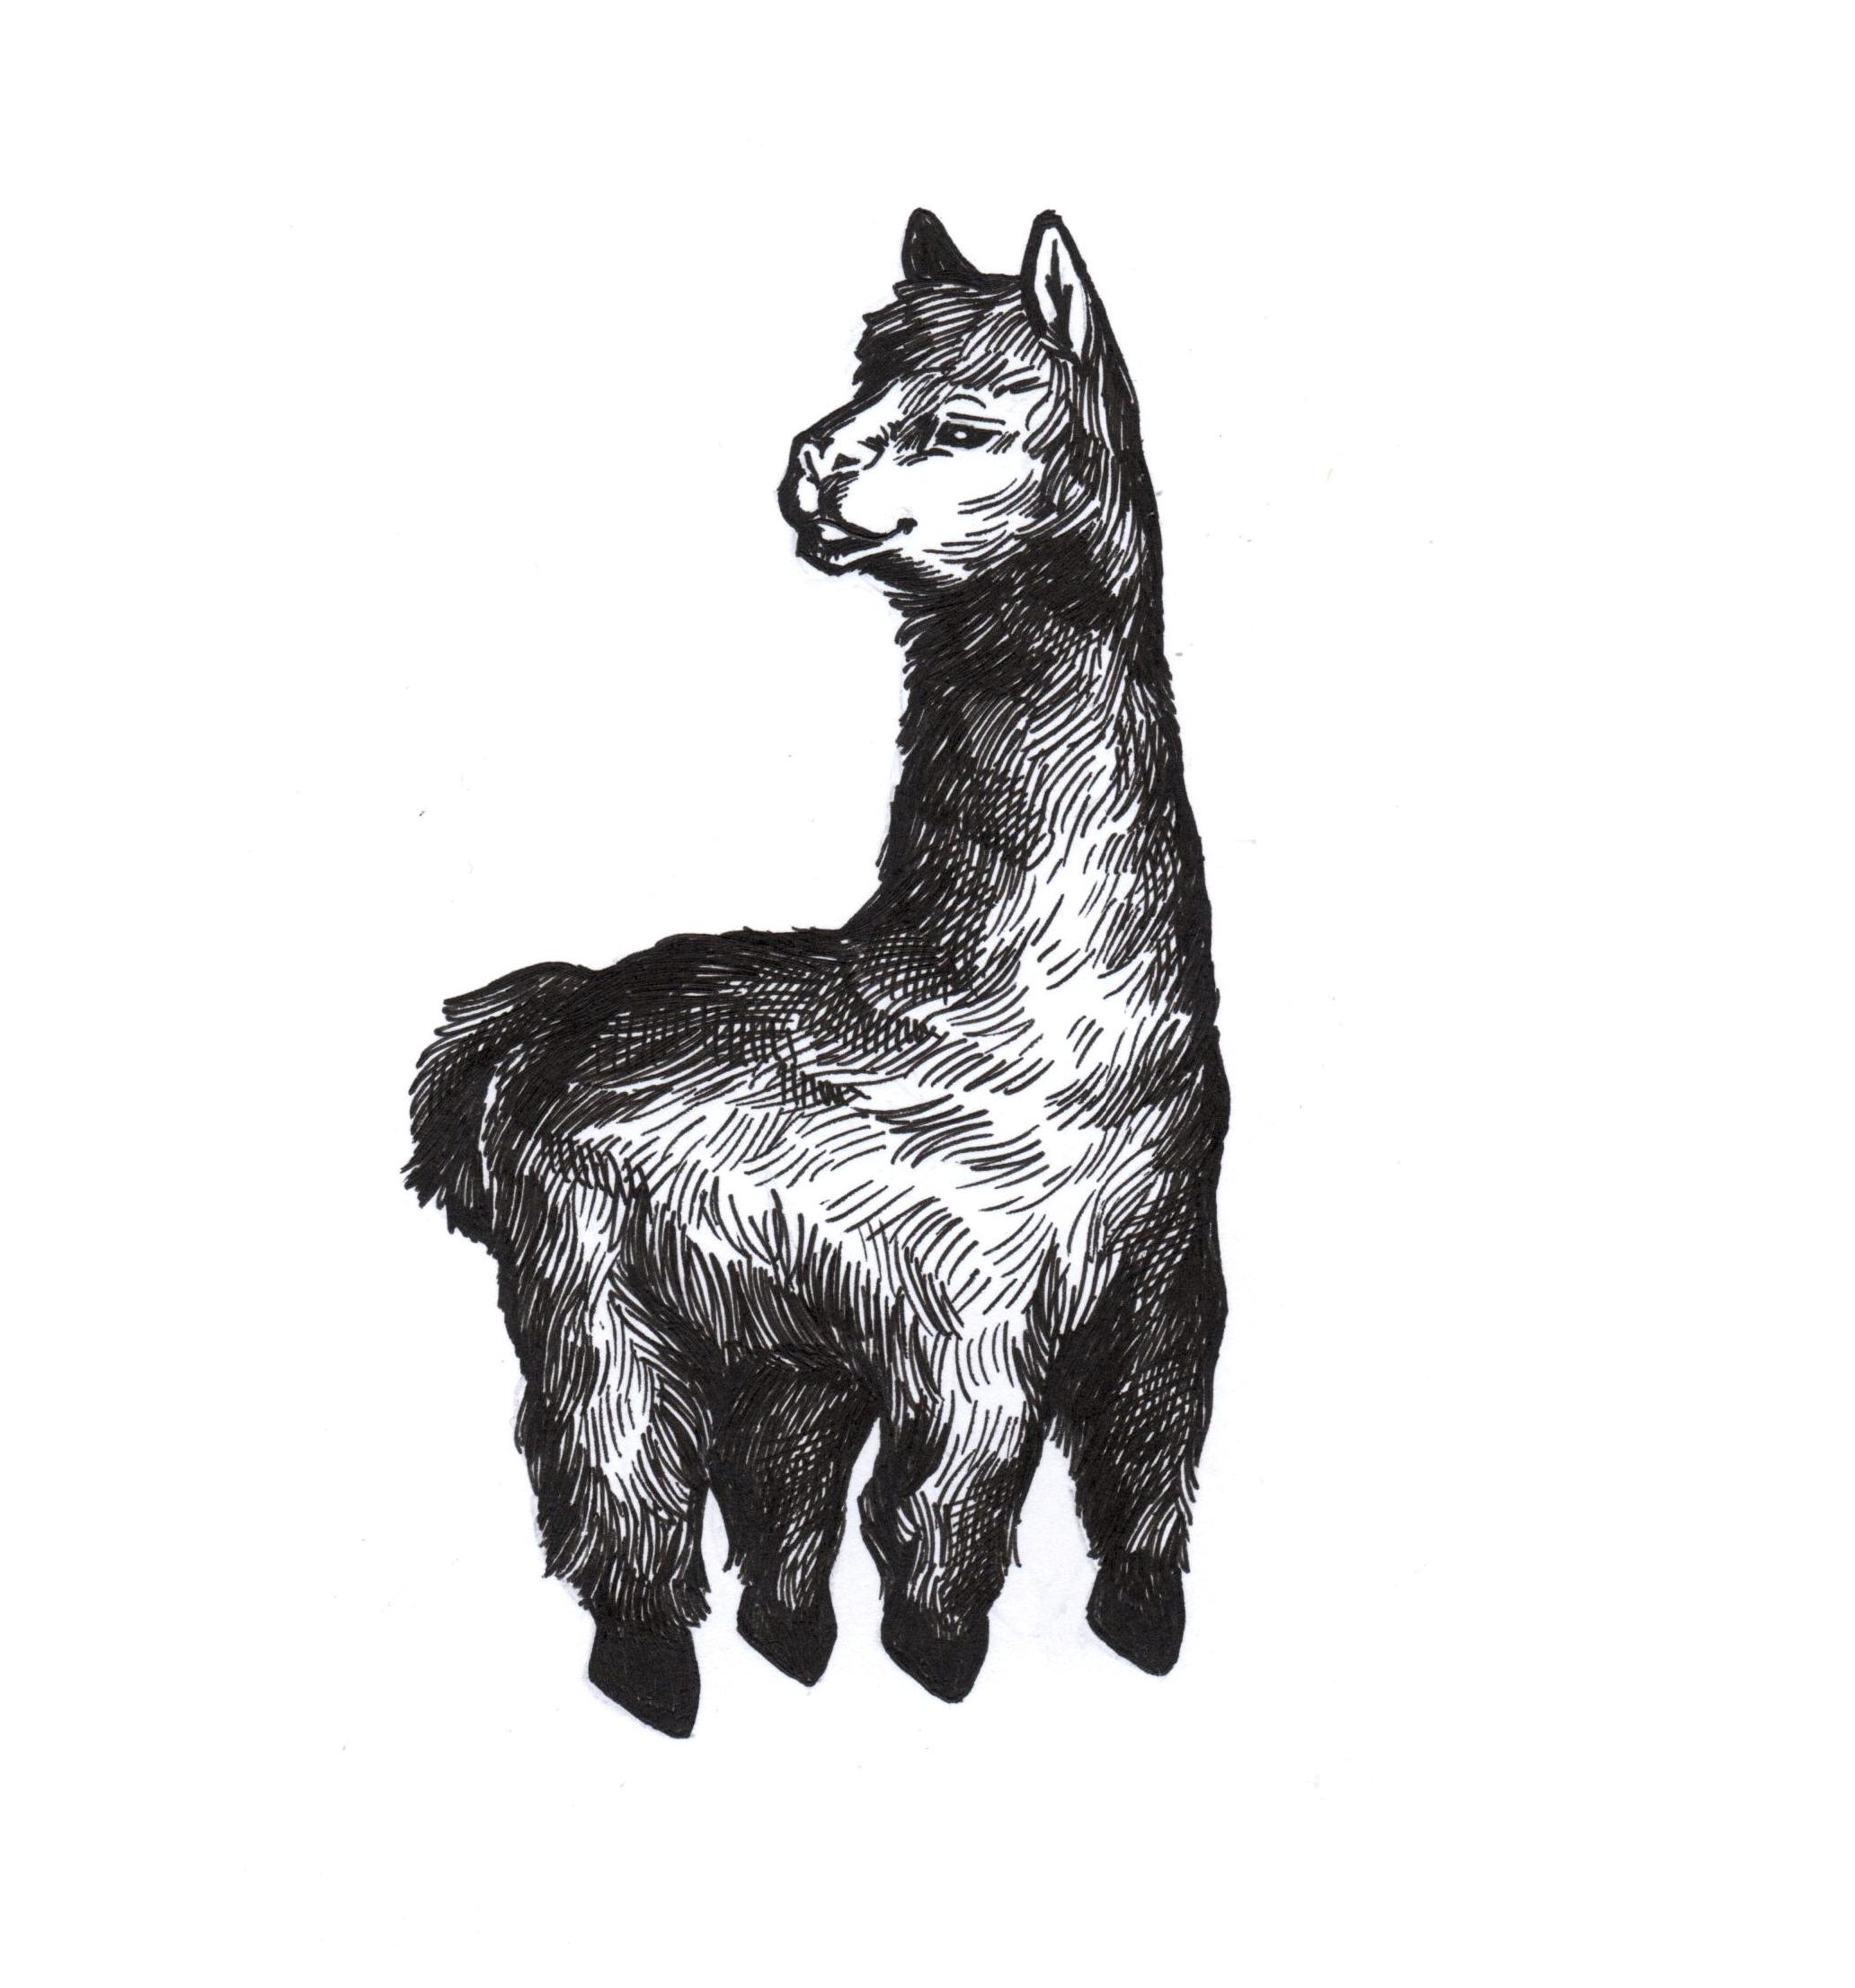 blackwork style of hand drawn alpaca